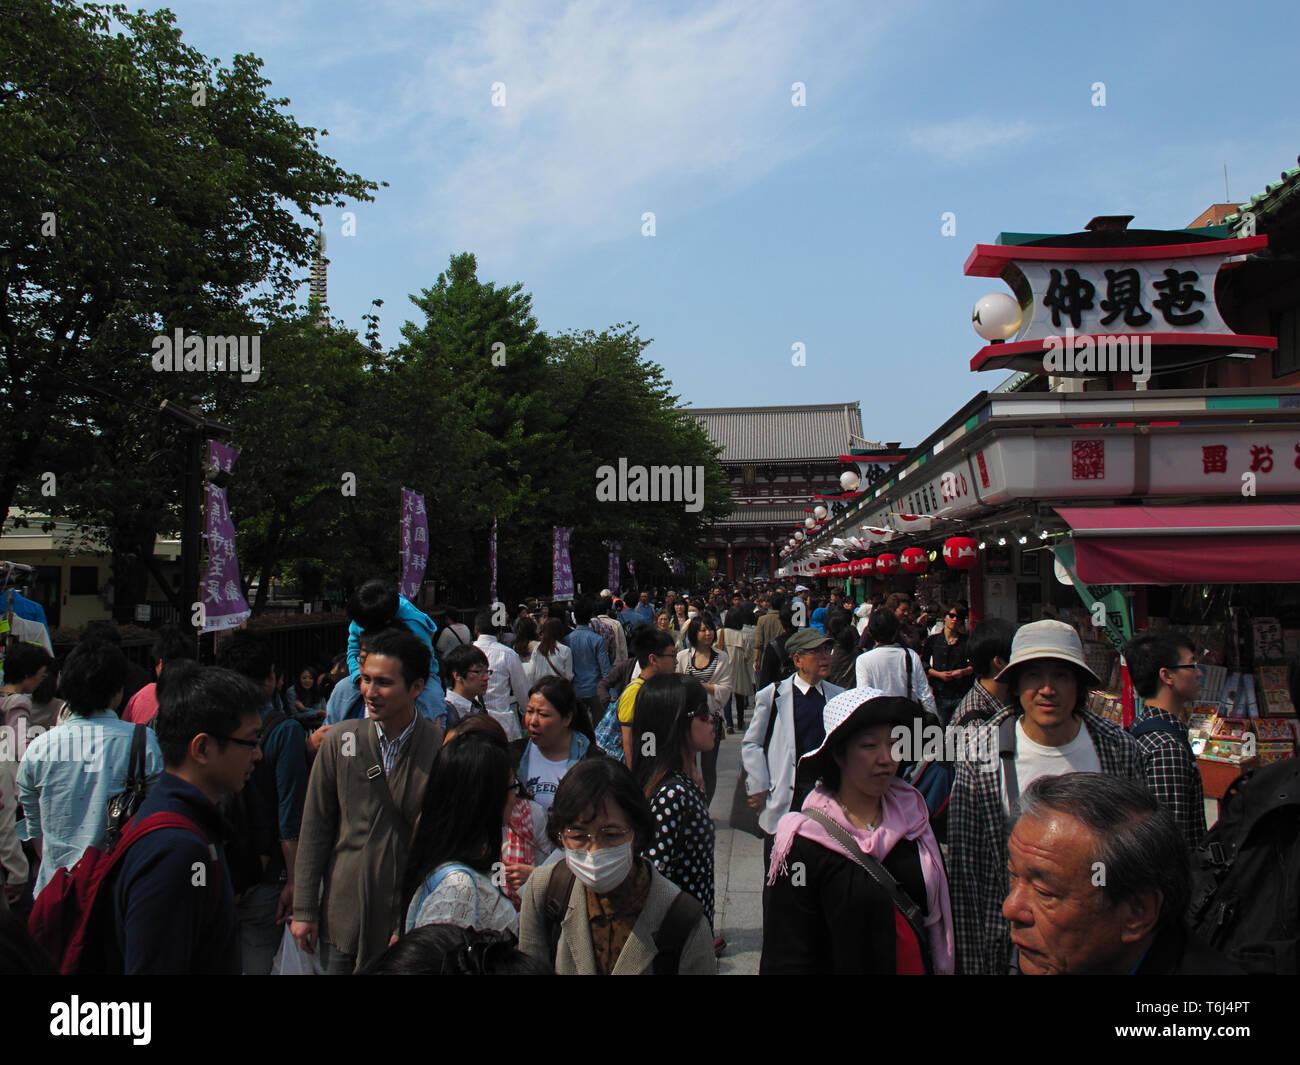 Ameyoko or Ameyayokocho market near Ueno station. One of main shopping street in Tokyo. Tokyo, Japan Stock Photo